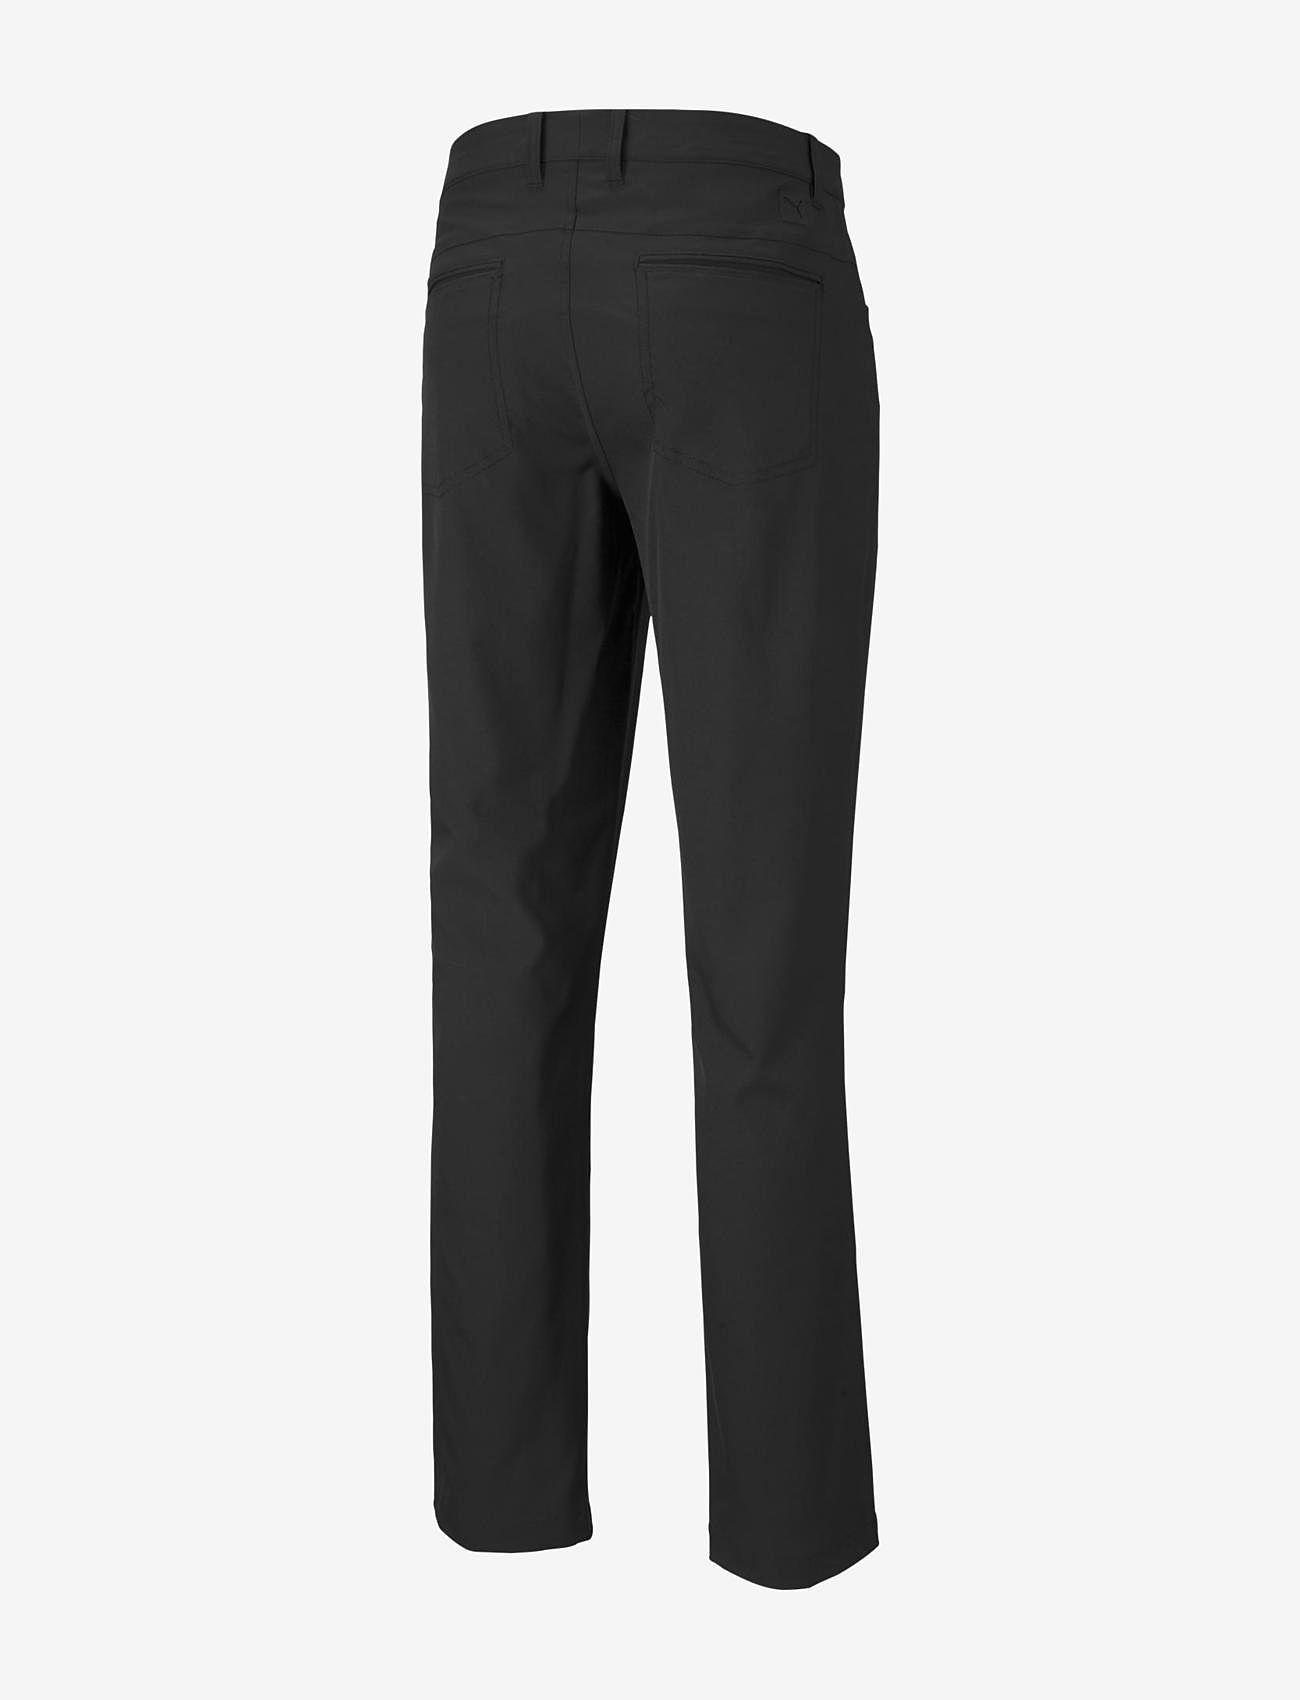 PUMA Golf - Jackpot 5 Pocket Pant - golf pants - puma black - 1